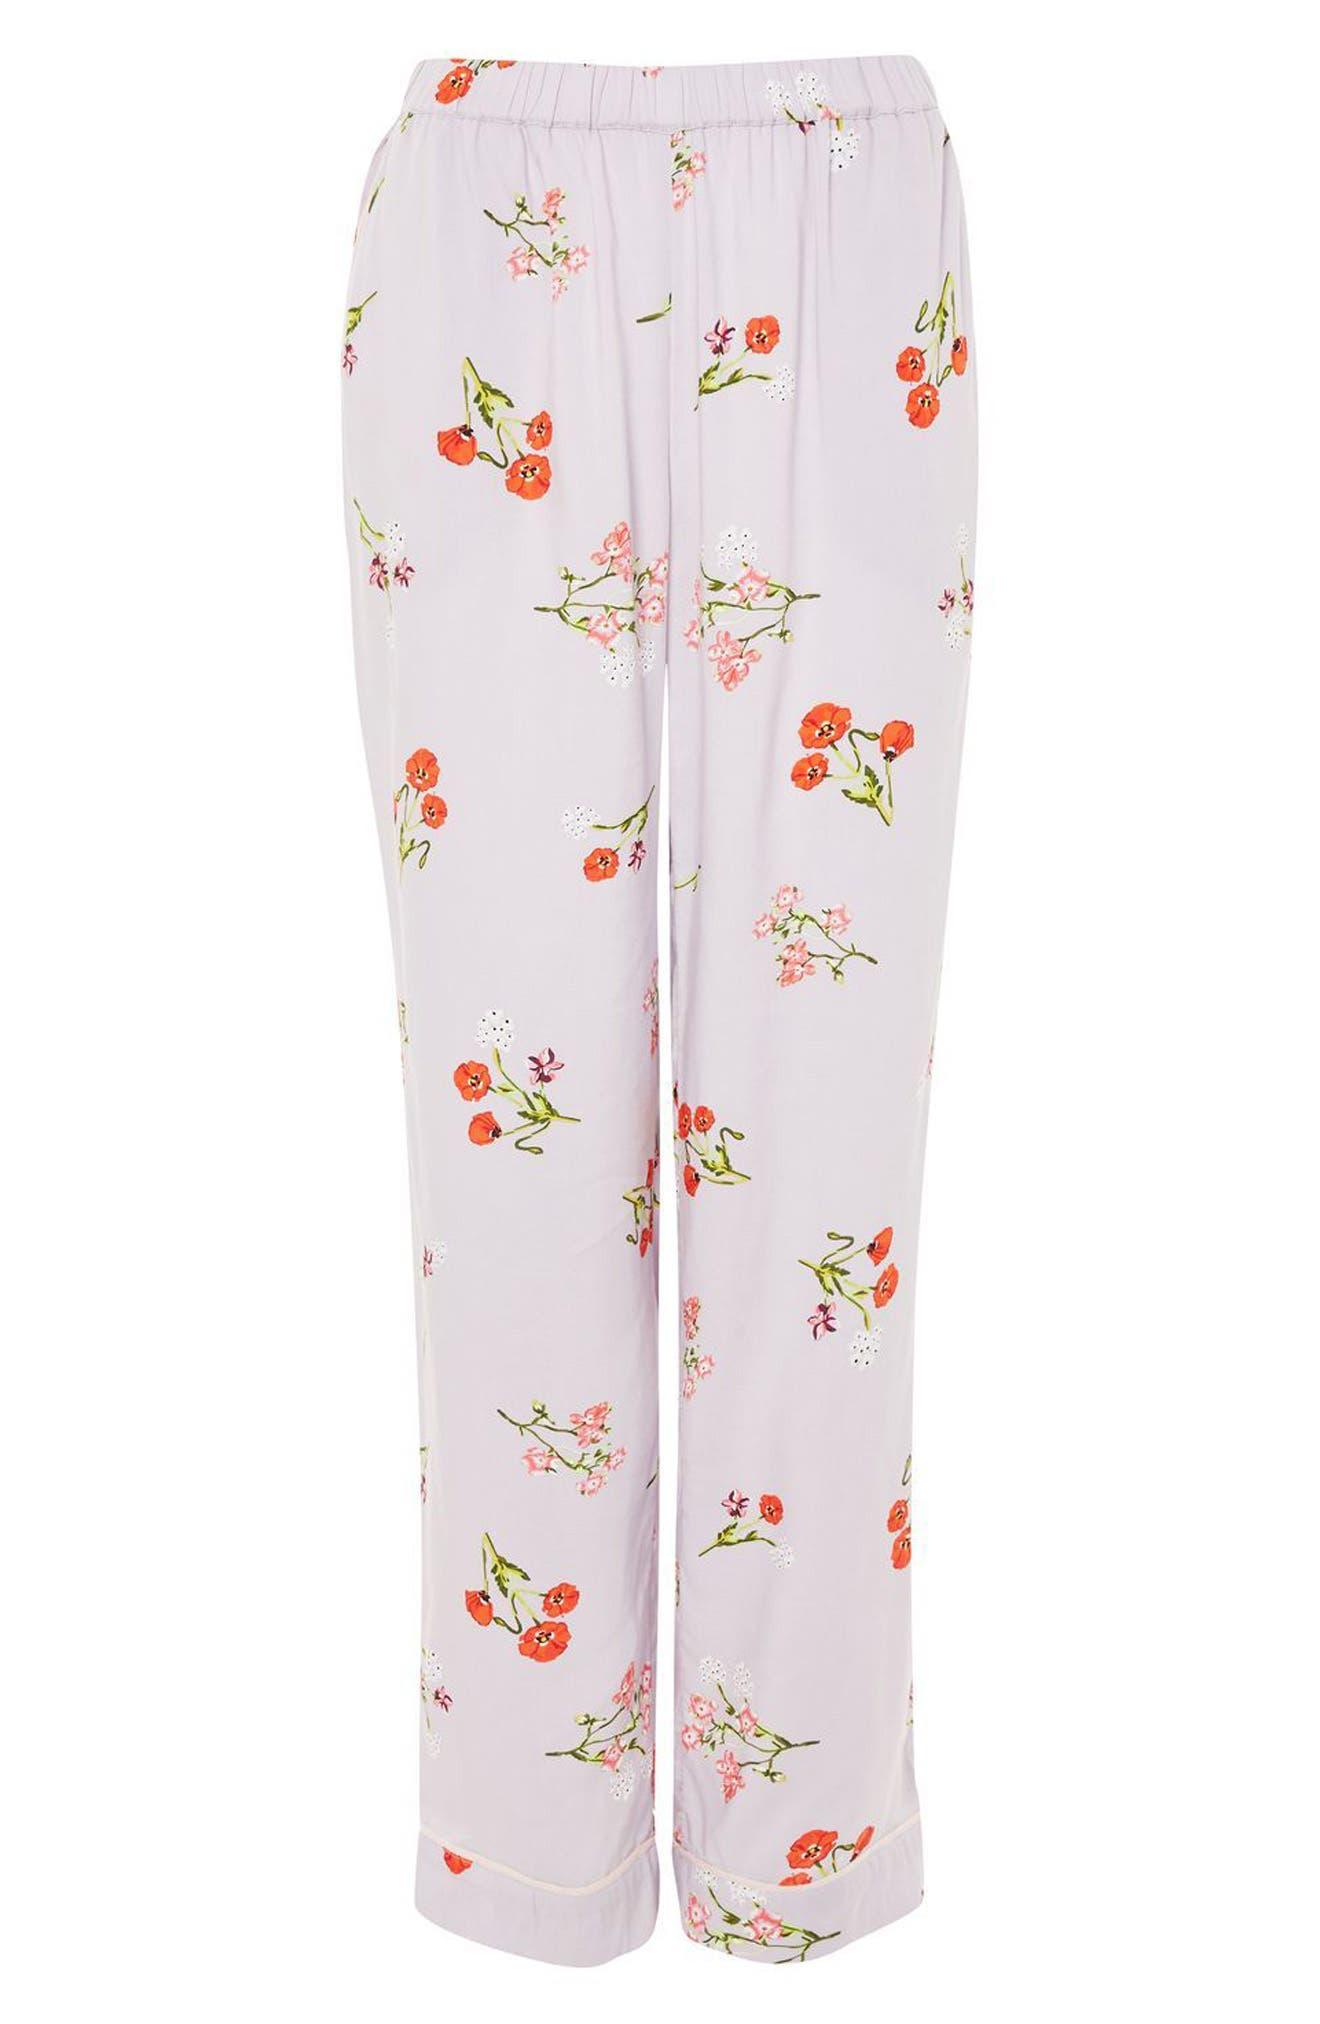 Poppy Print Pajama Pants,                             Alternate thumbnail 3, color,                             450